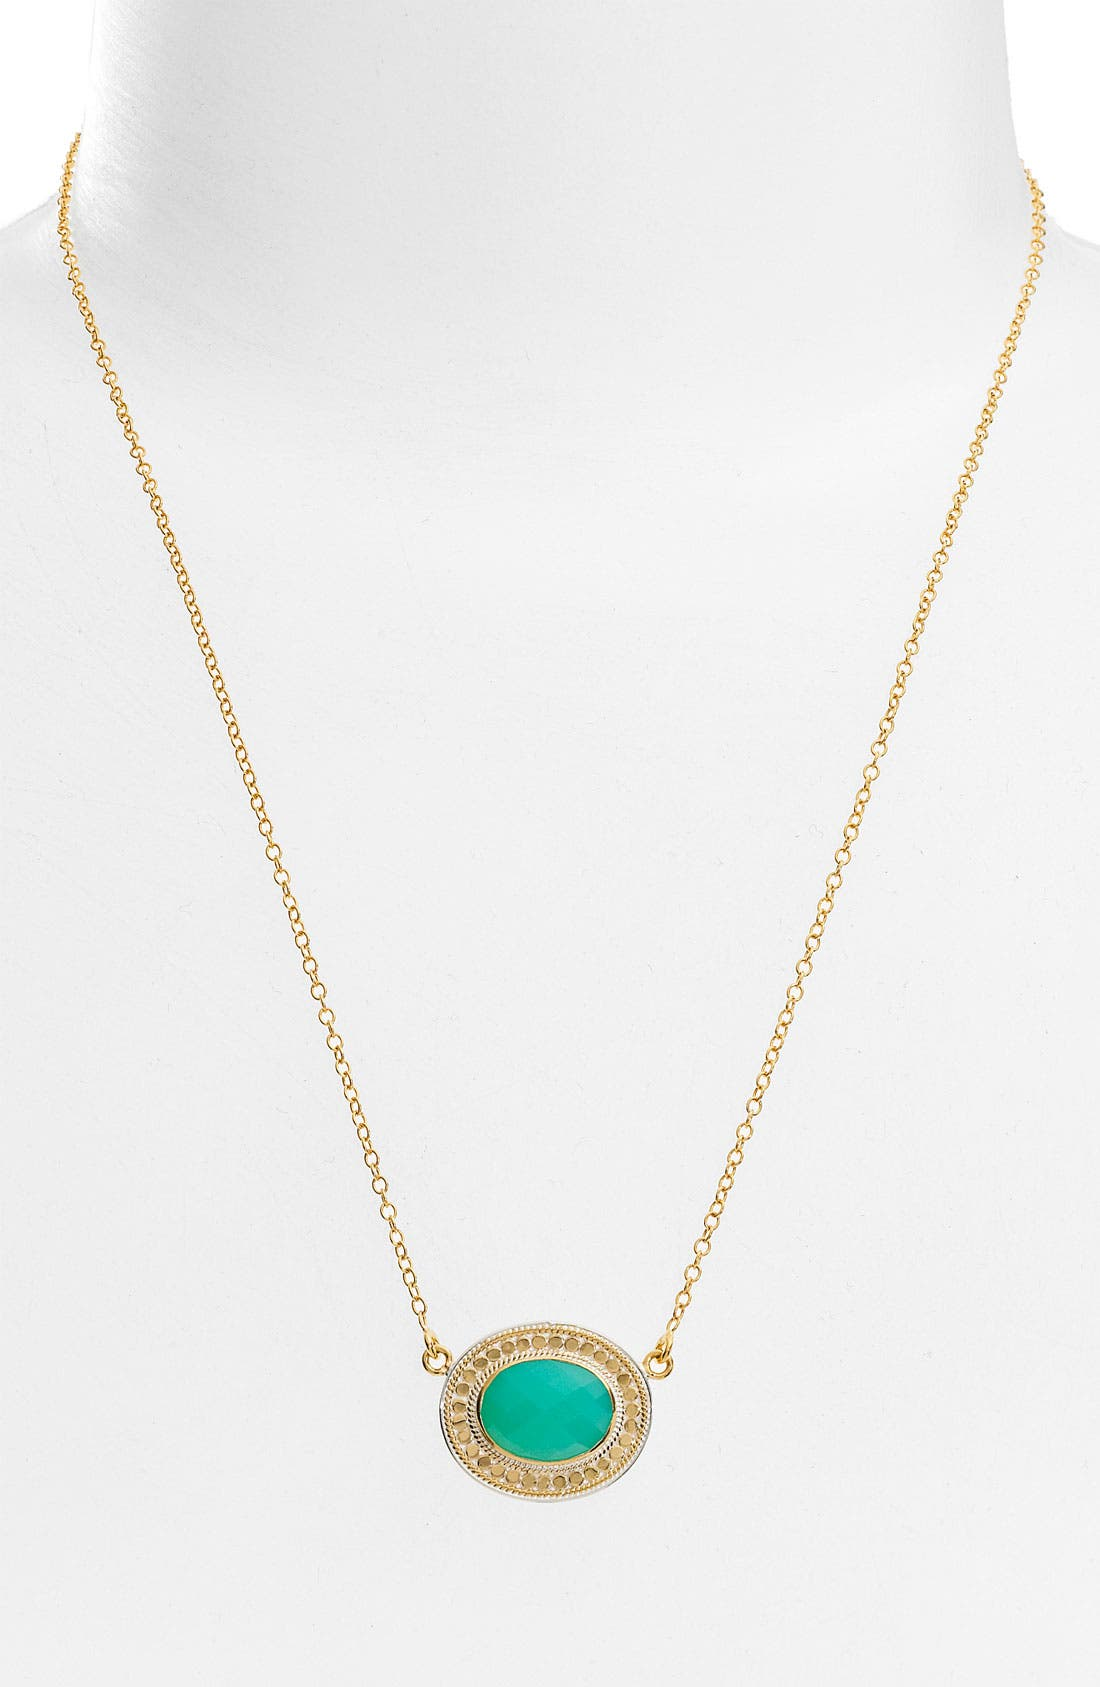 ANNA BECK 'Gili' Oval Disc Necklace, Main, color, 710